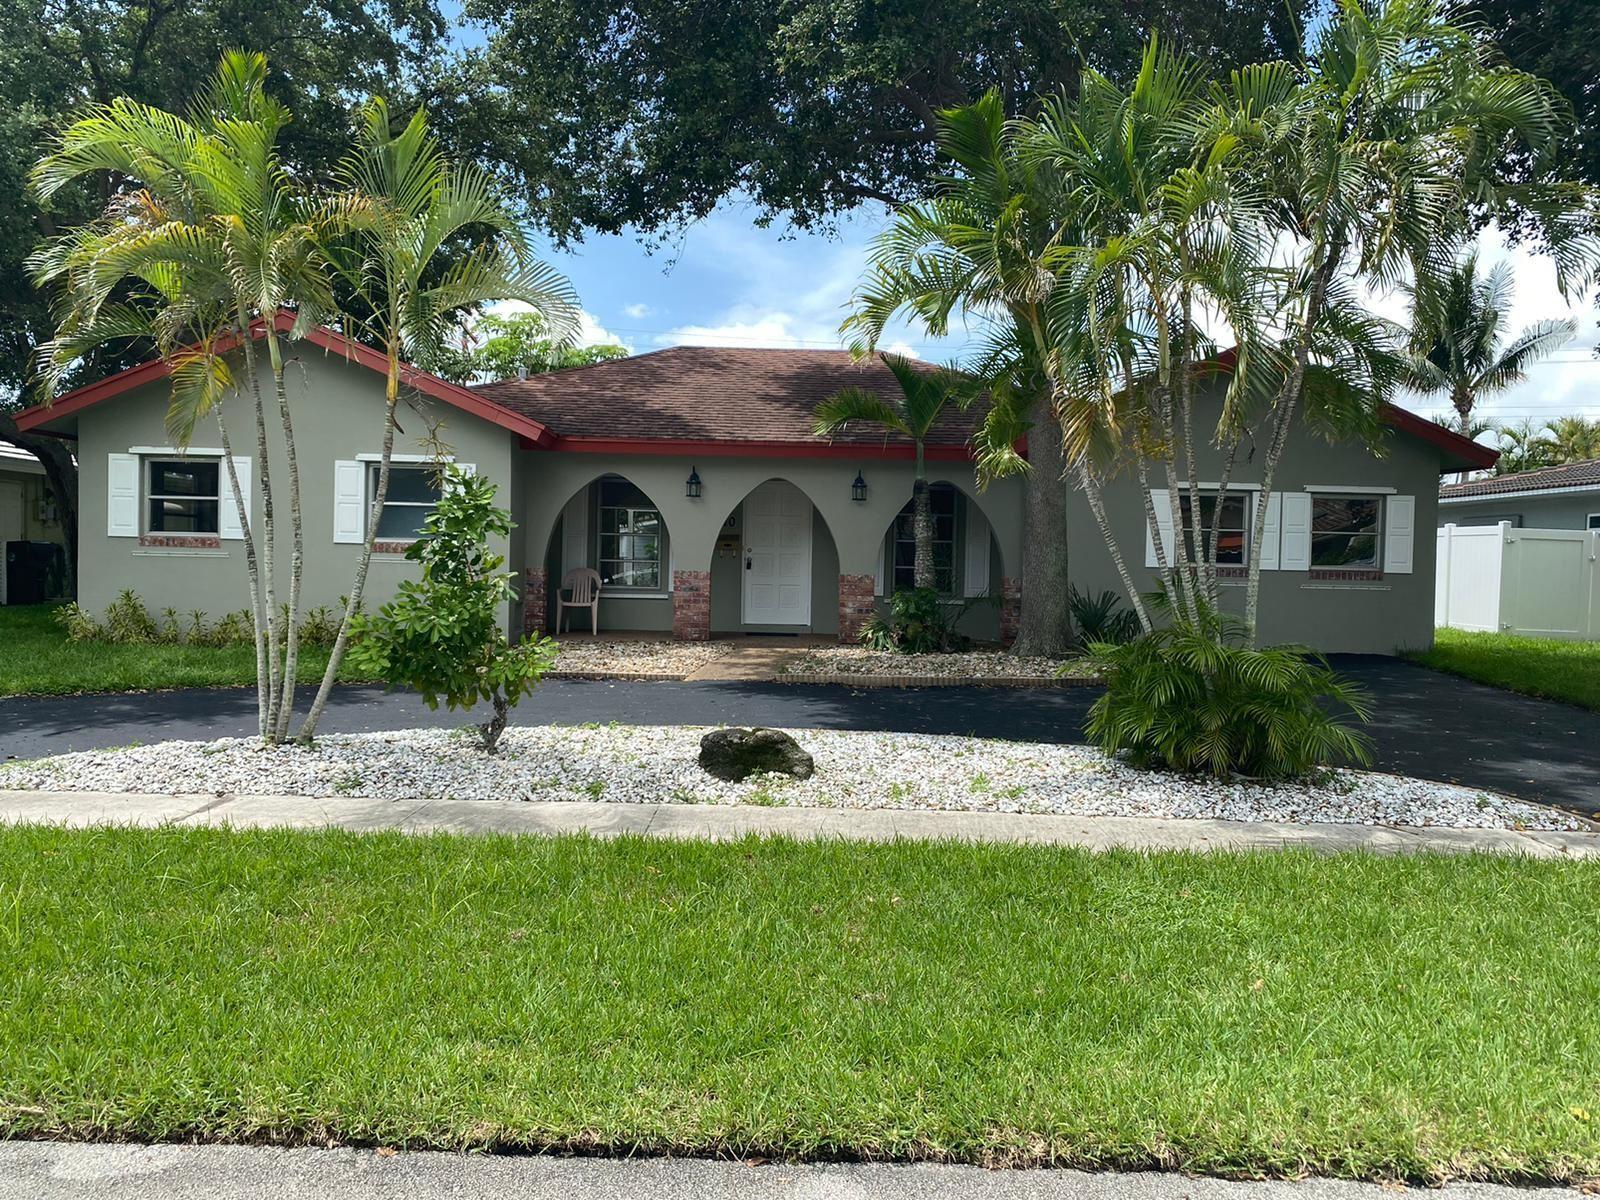 970 SW 5th Street, Boca Raton, FL 33486 - #: RX-10640786